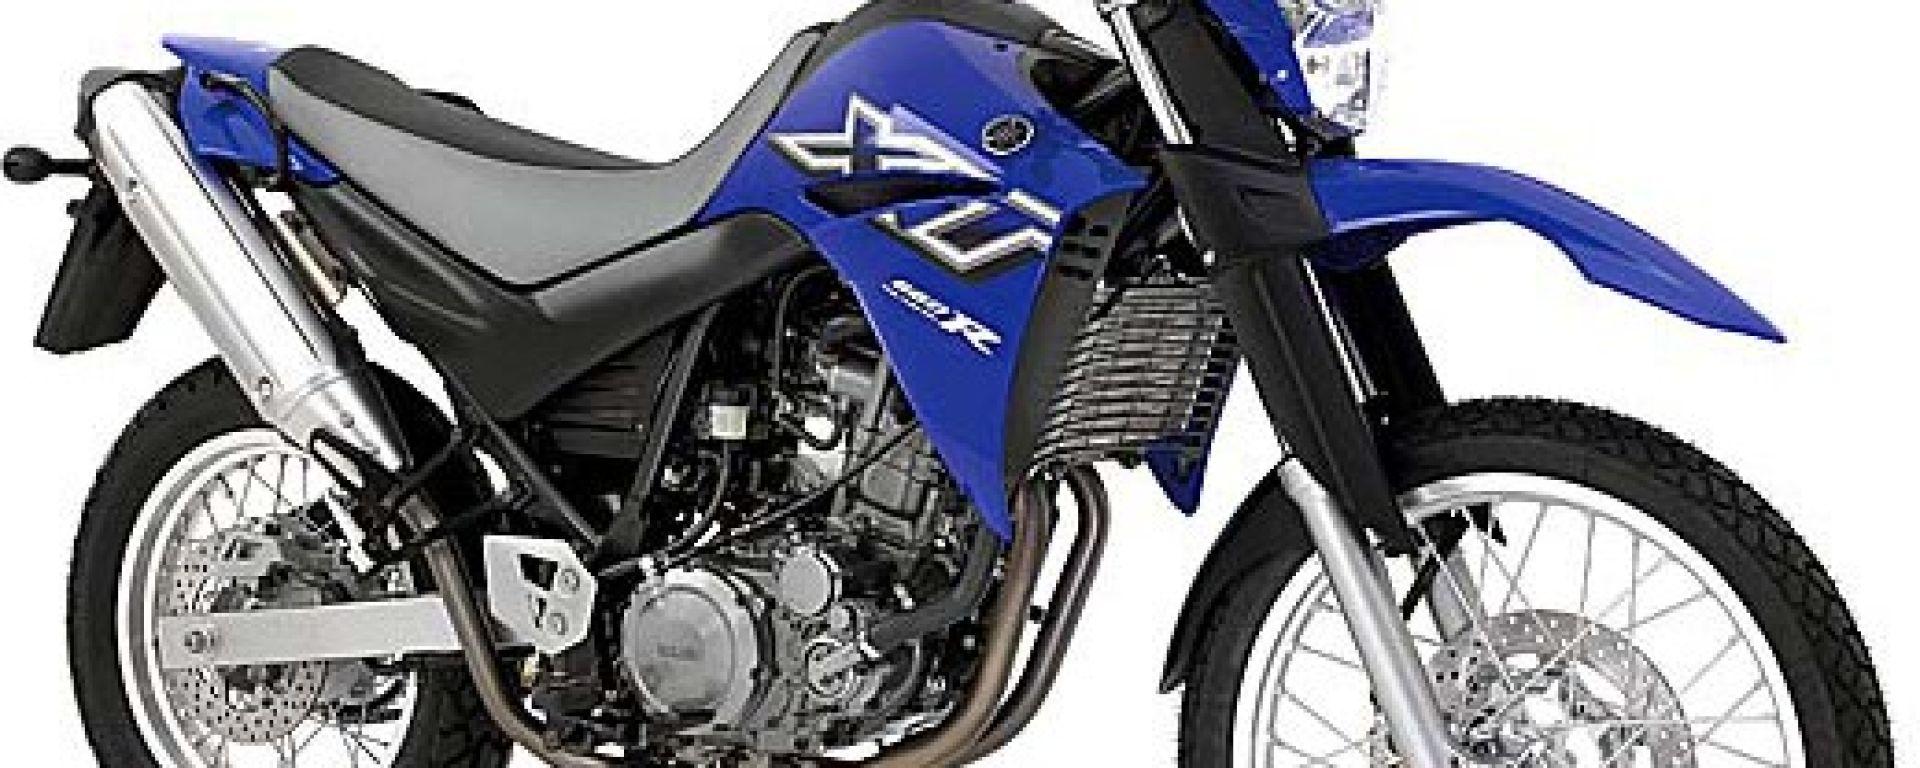 Test Drive Yamaha Xt 660 R Motorbox